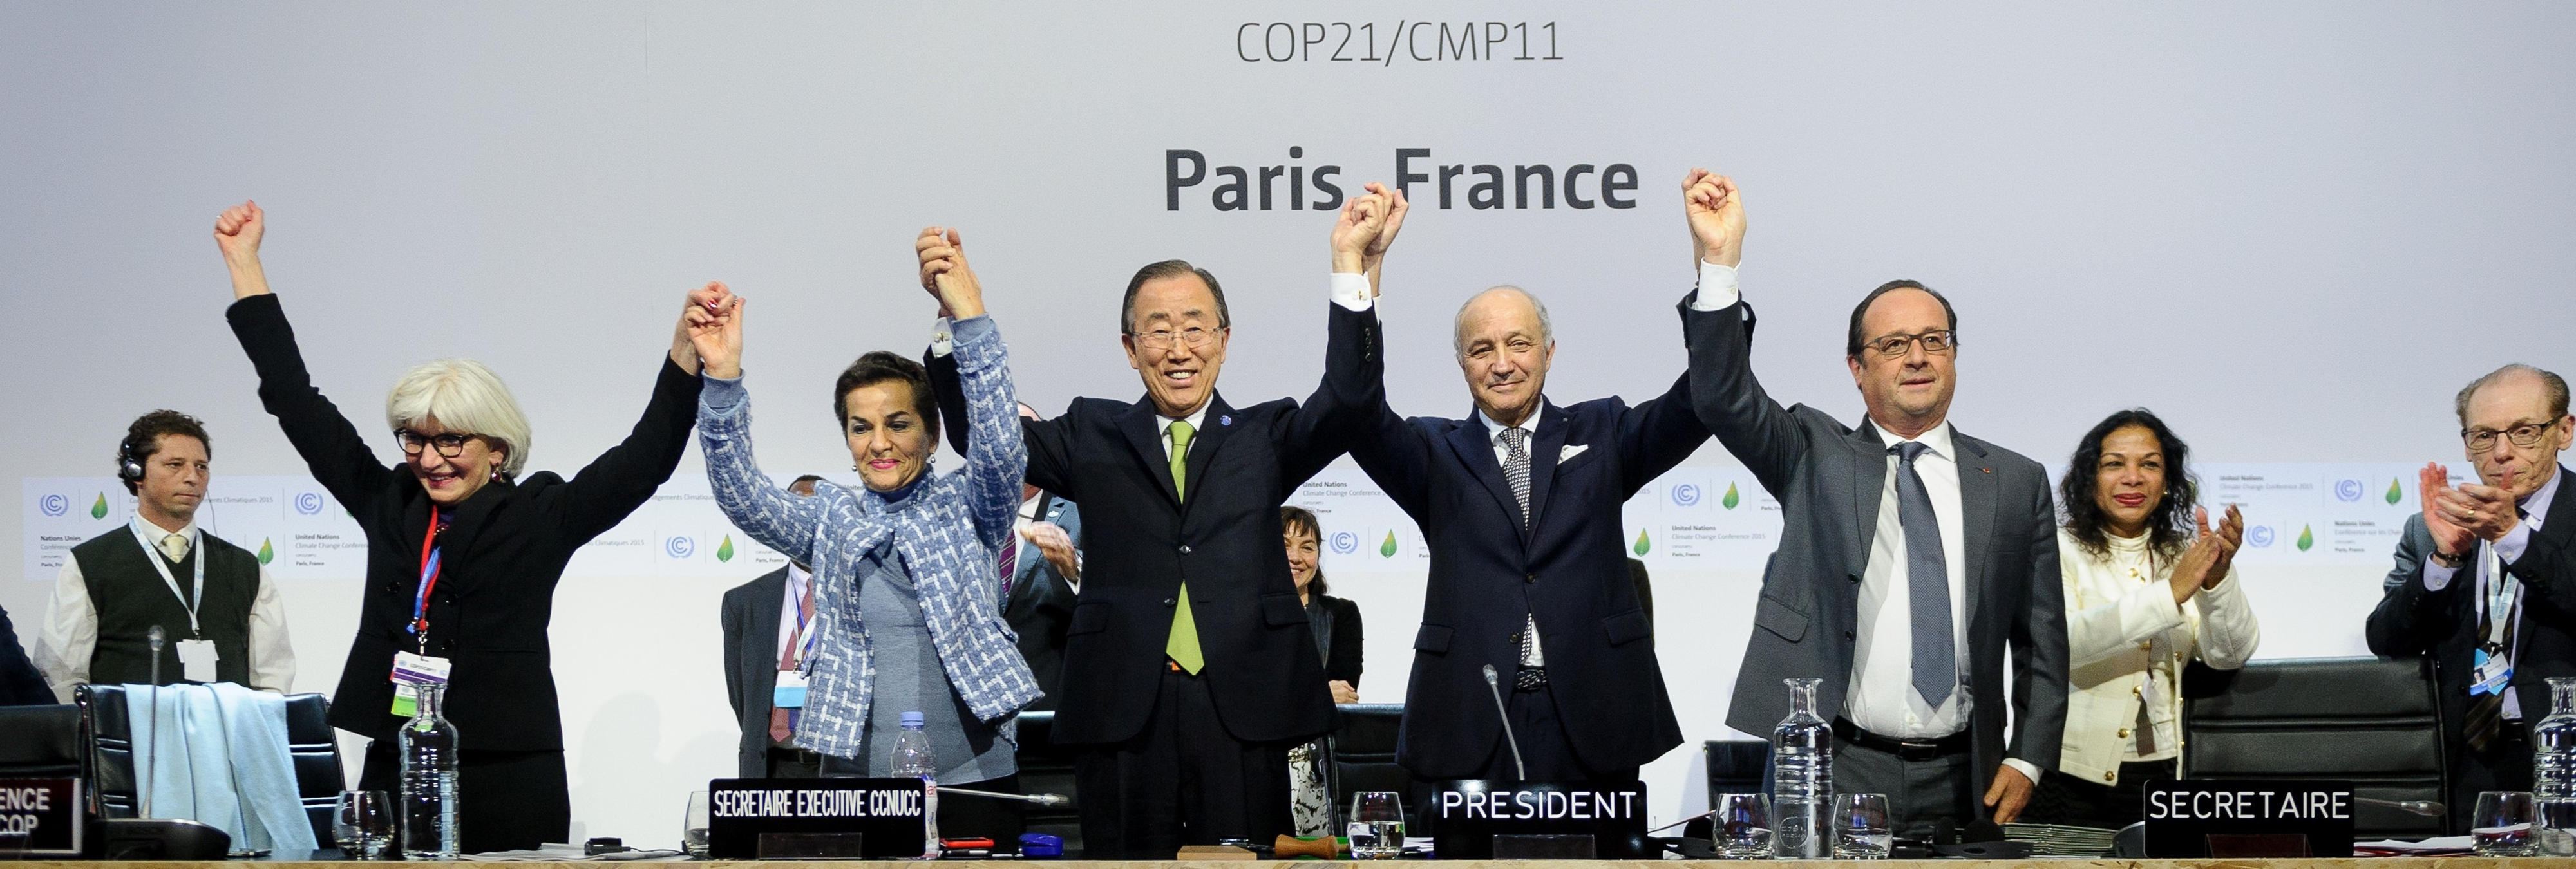 Cumbre del Clima: Crónica de un fracaso anunciado